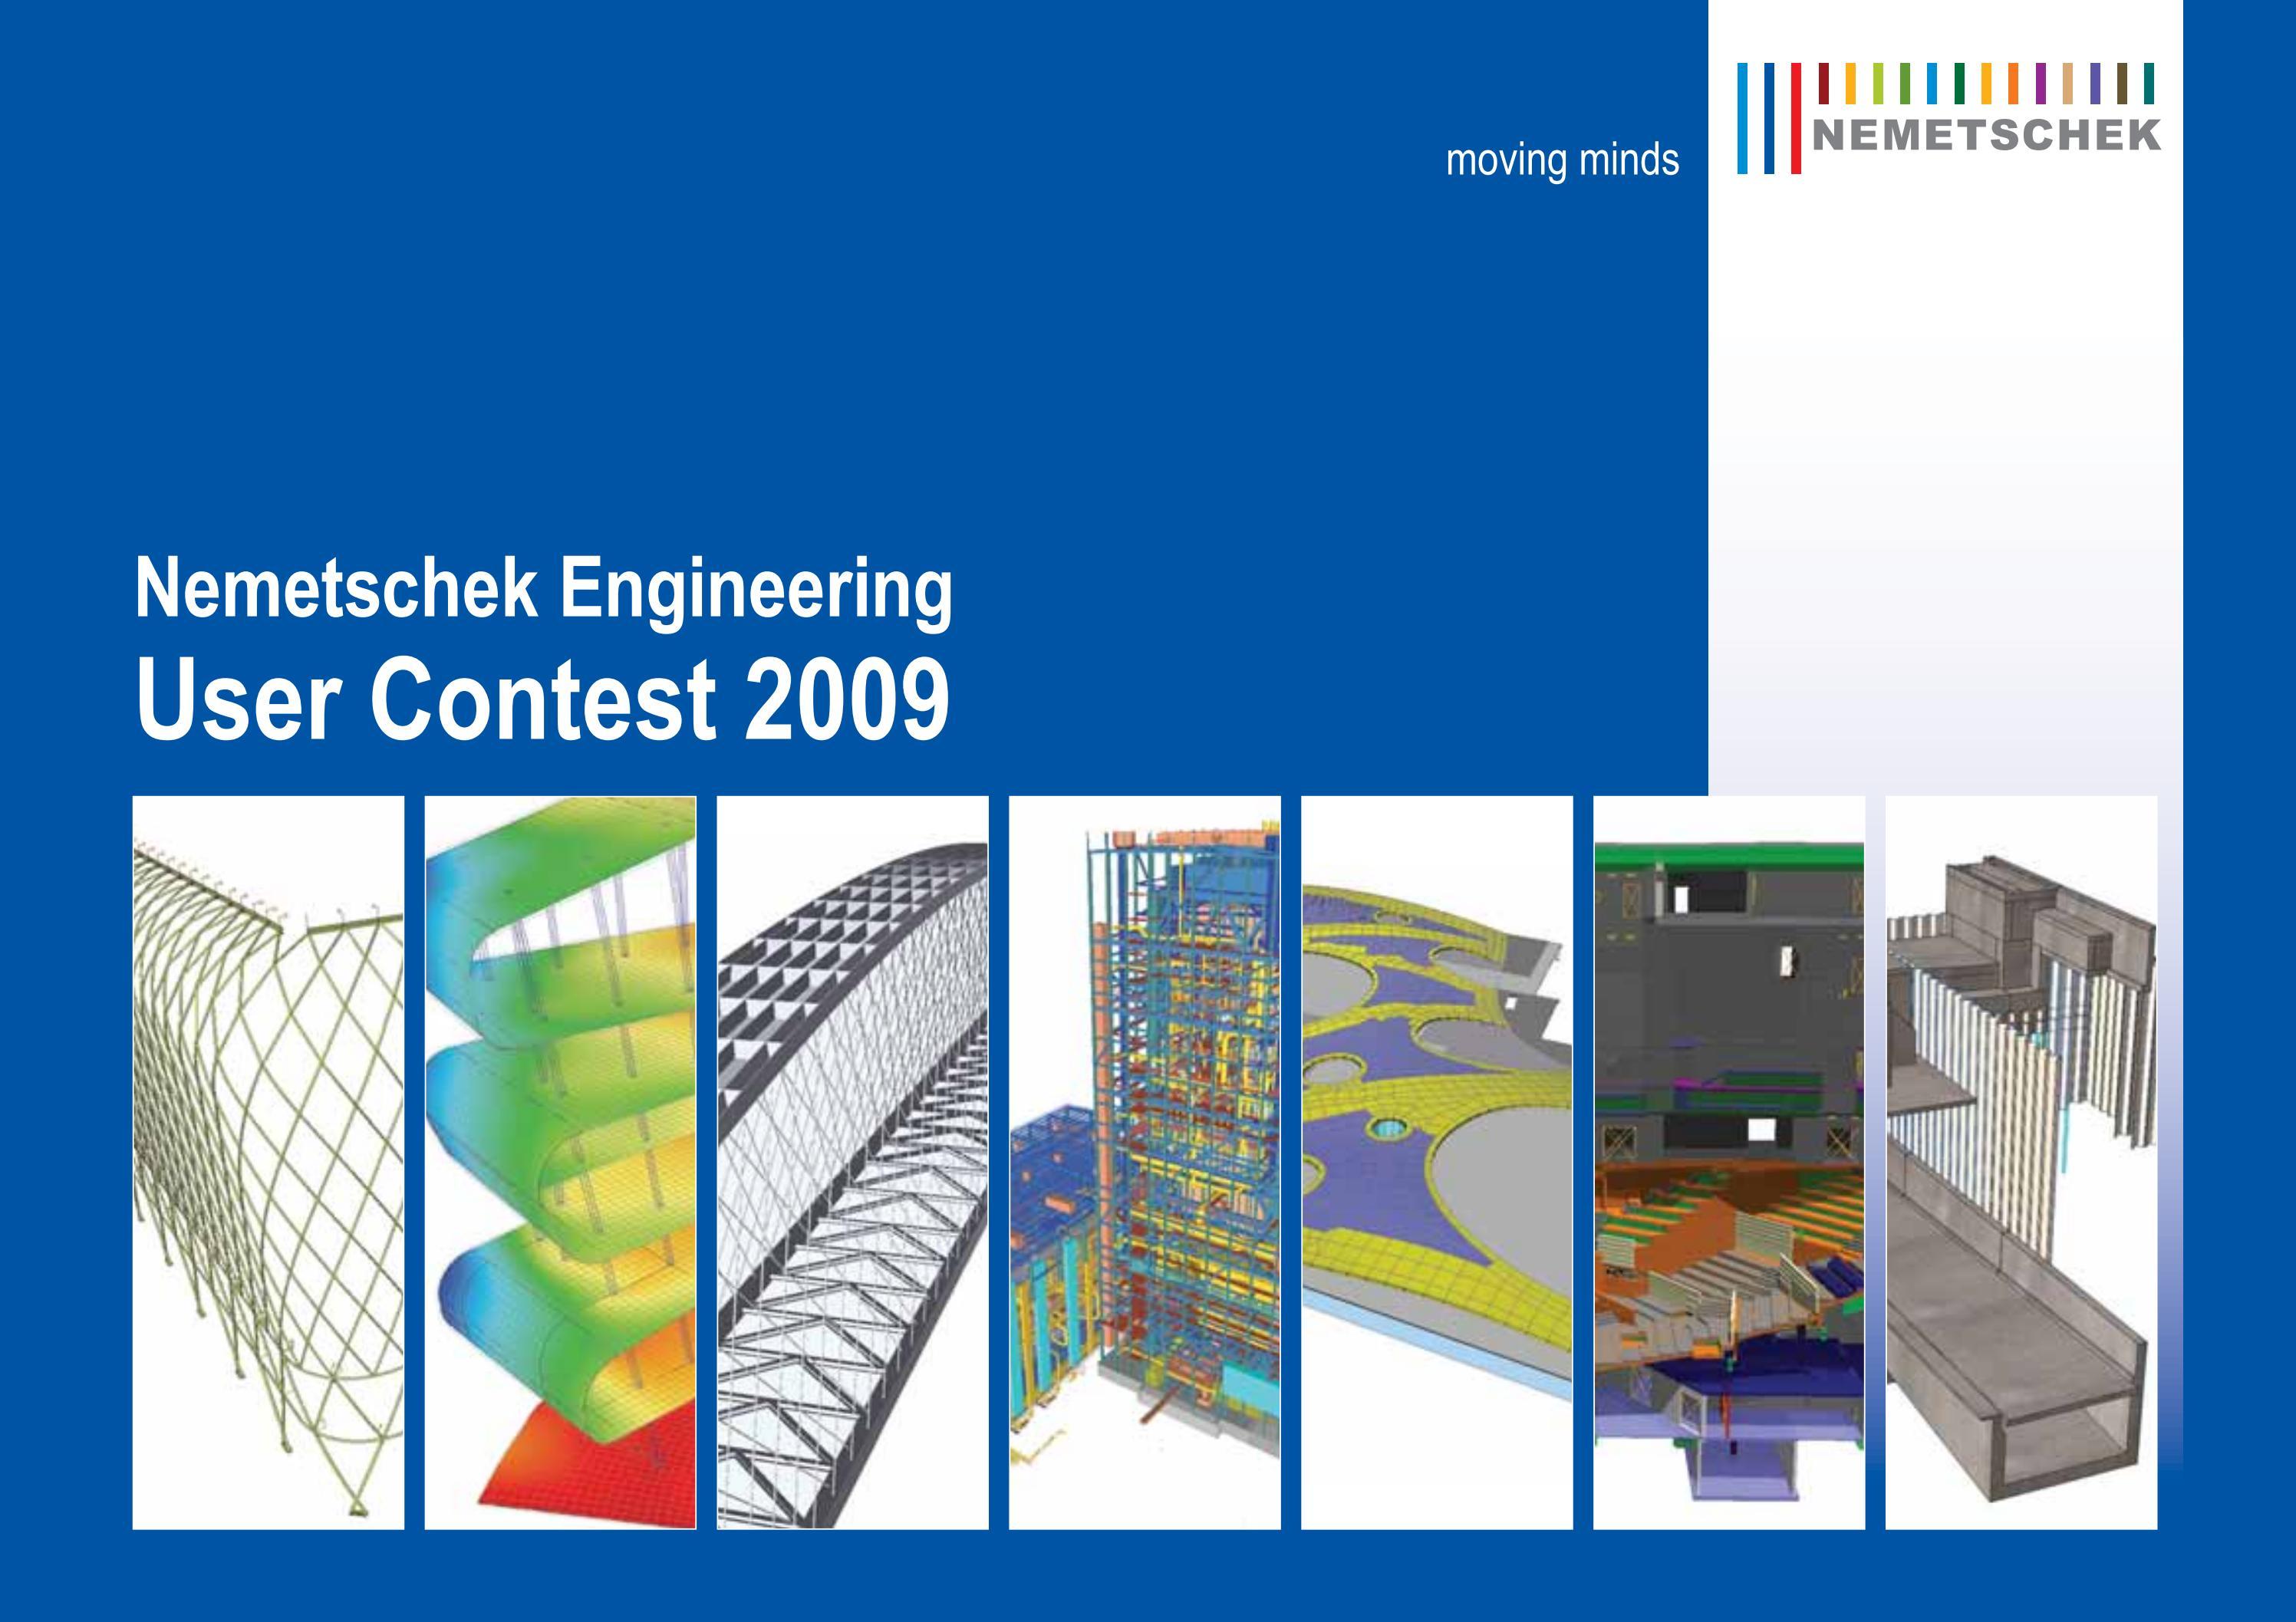 Nemetschek Engineering User Contest 2009 By Gurdal Atlamaz